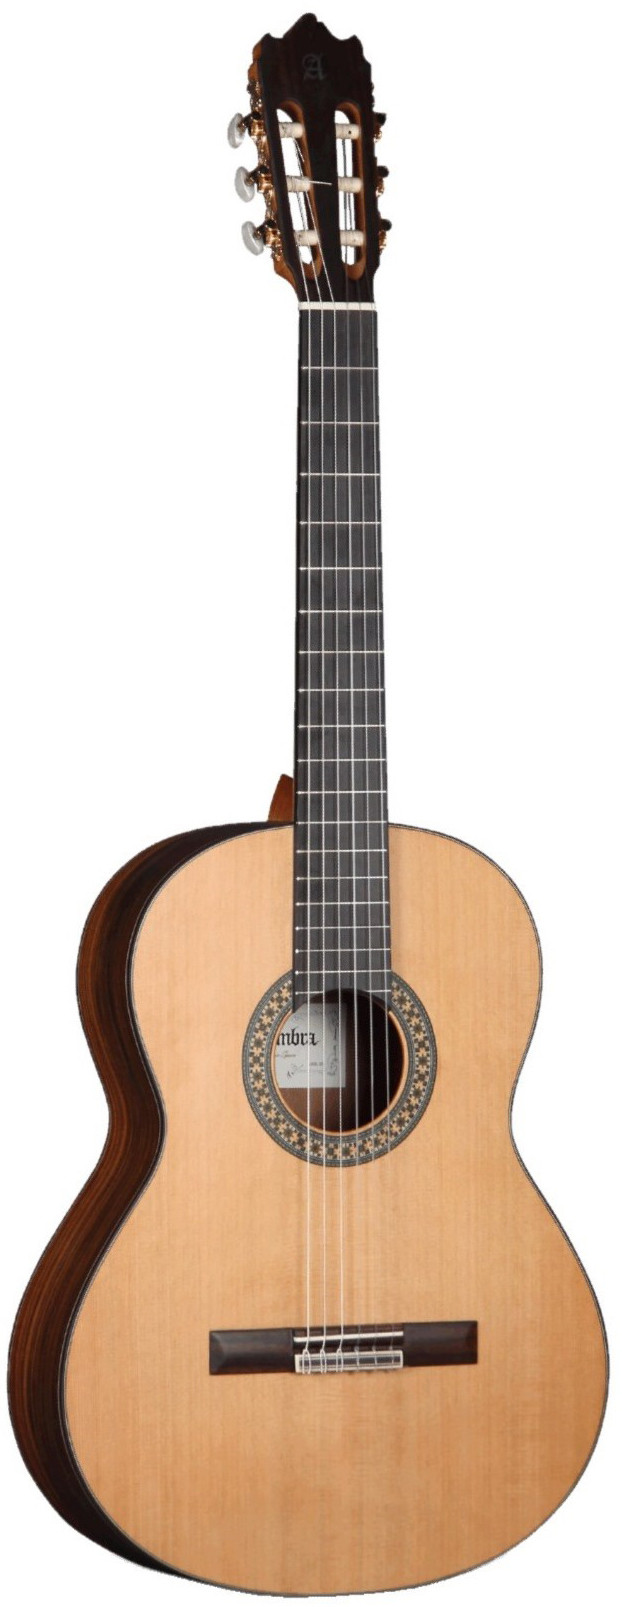 Гитара Alhambra 7.840 Open Pore 4OP